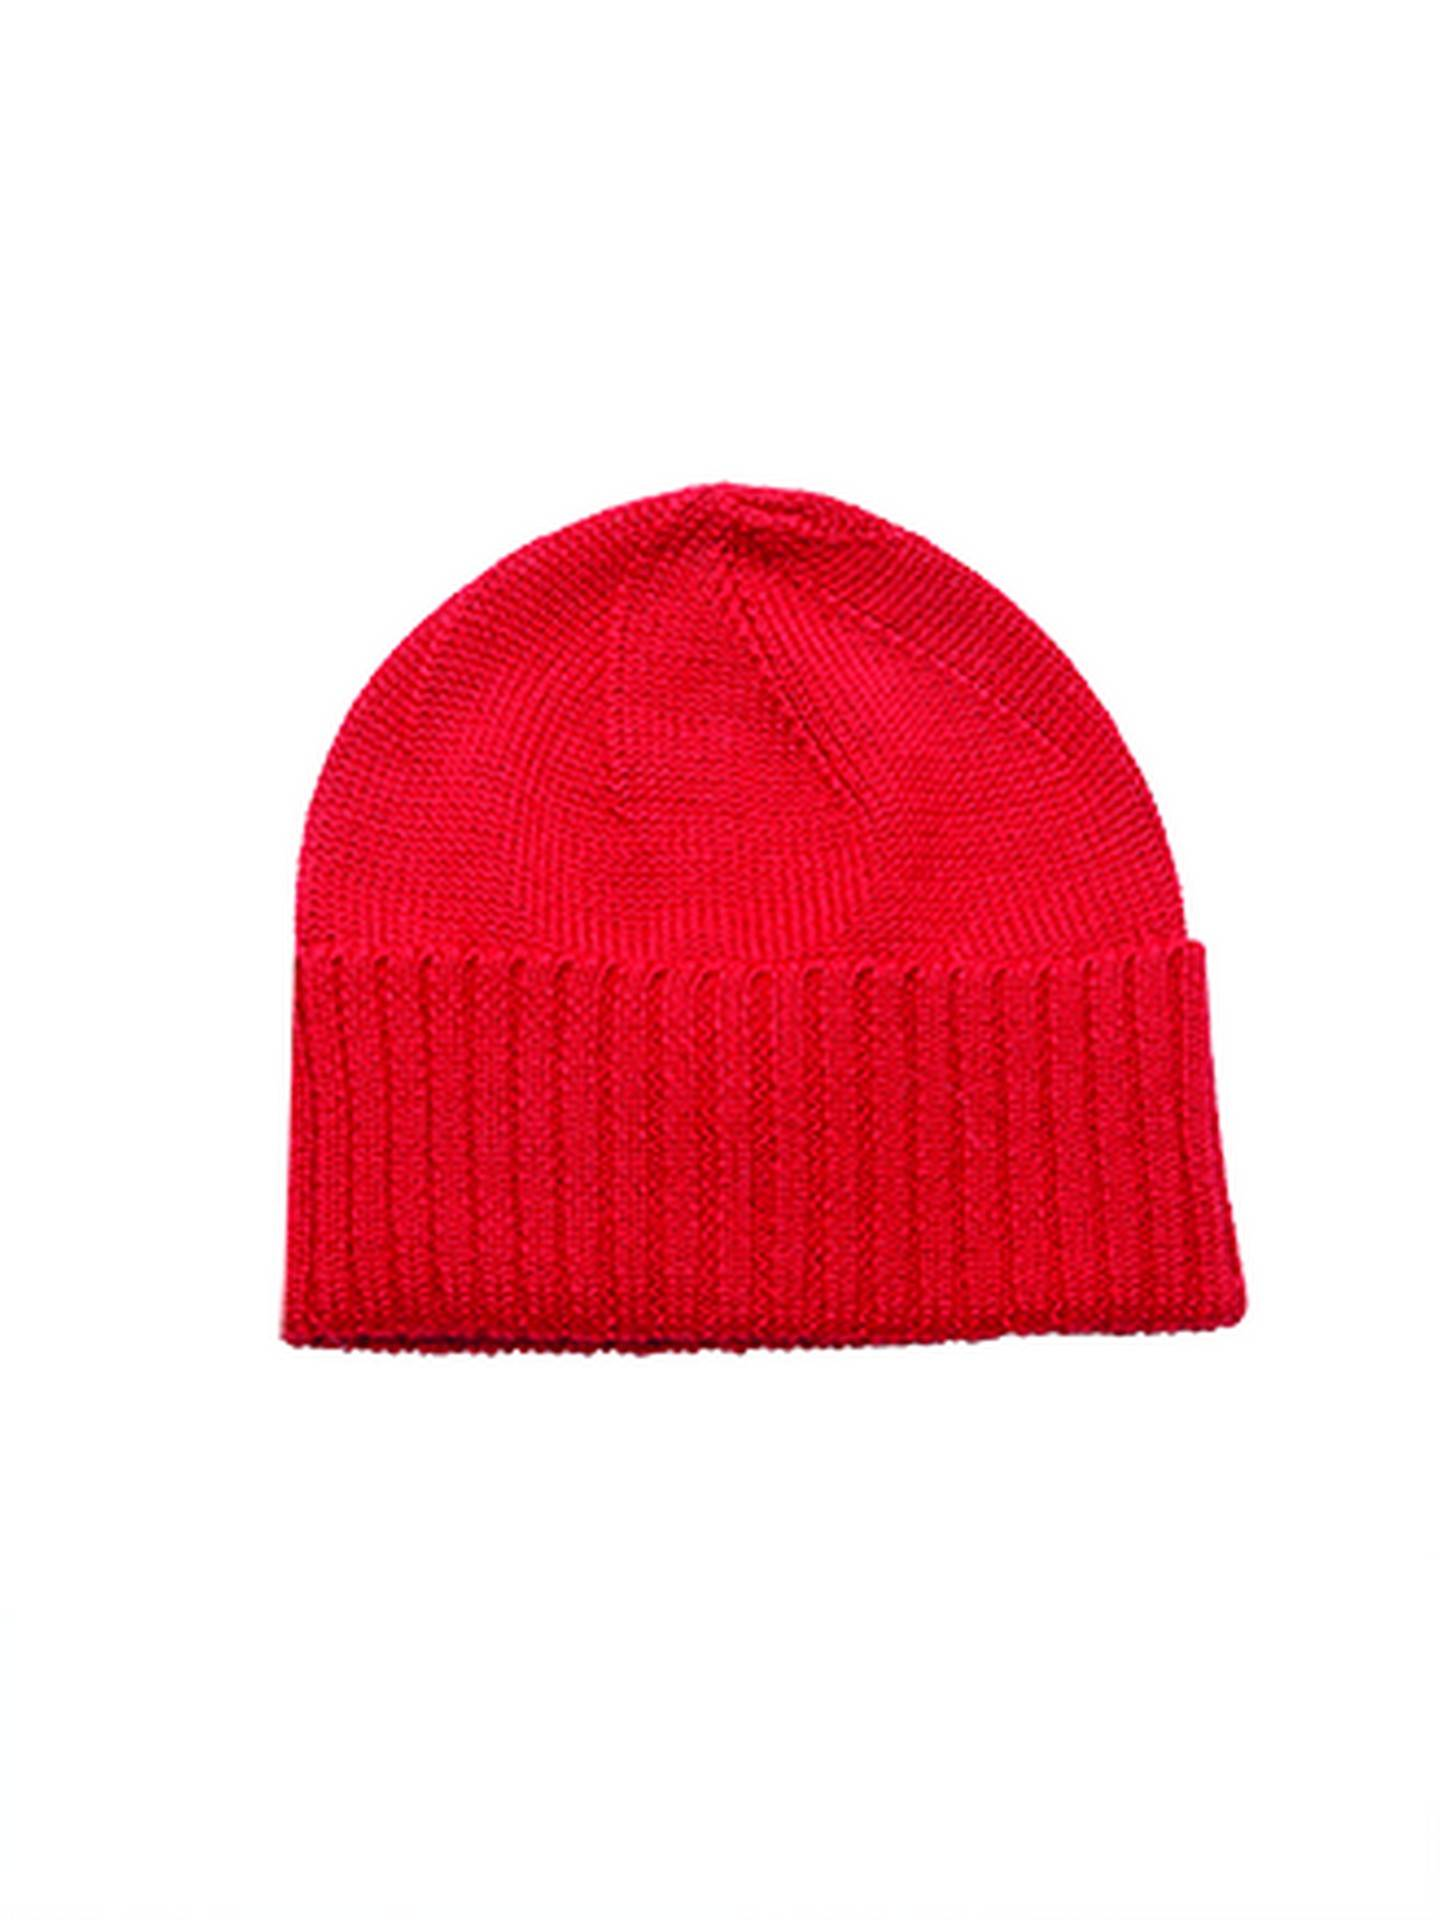 Alternative Apparel Londoner Beanie - Red - Size: OS